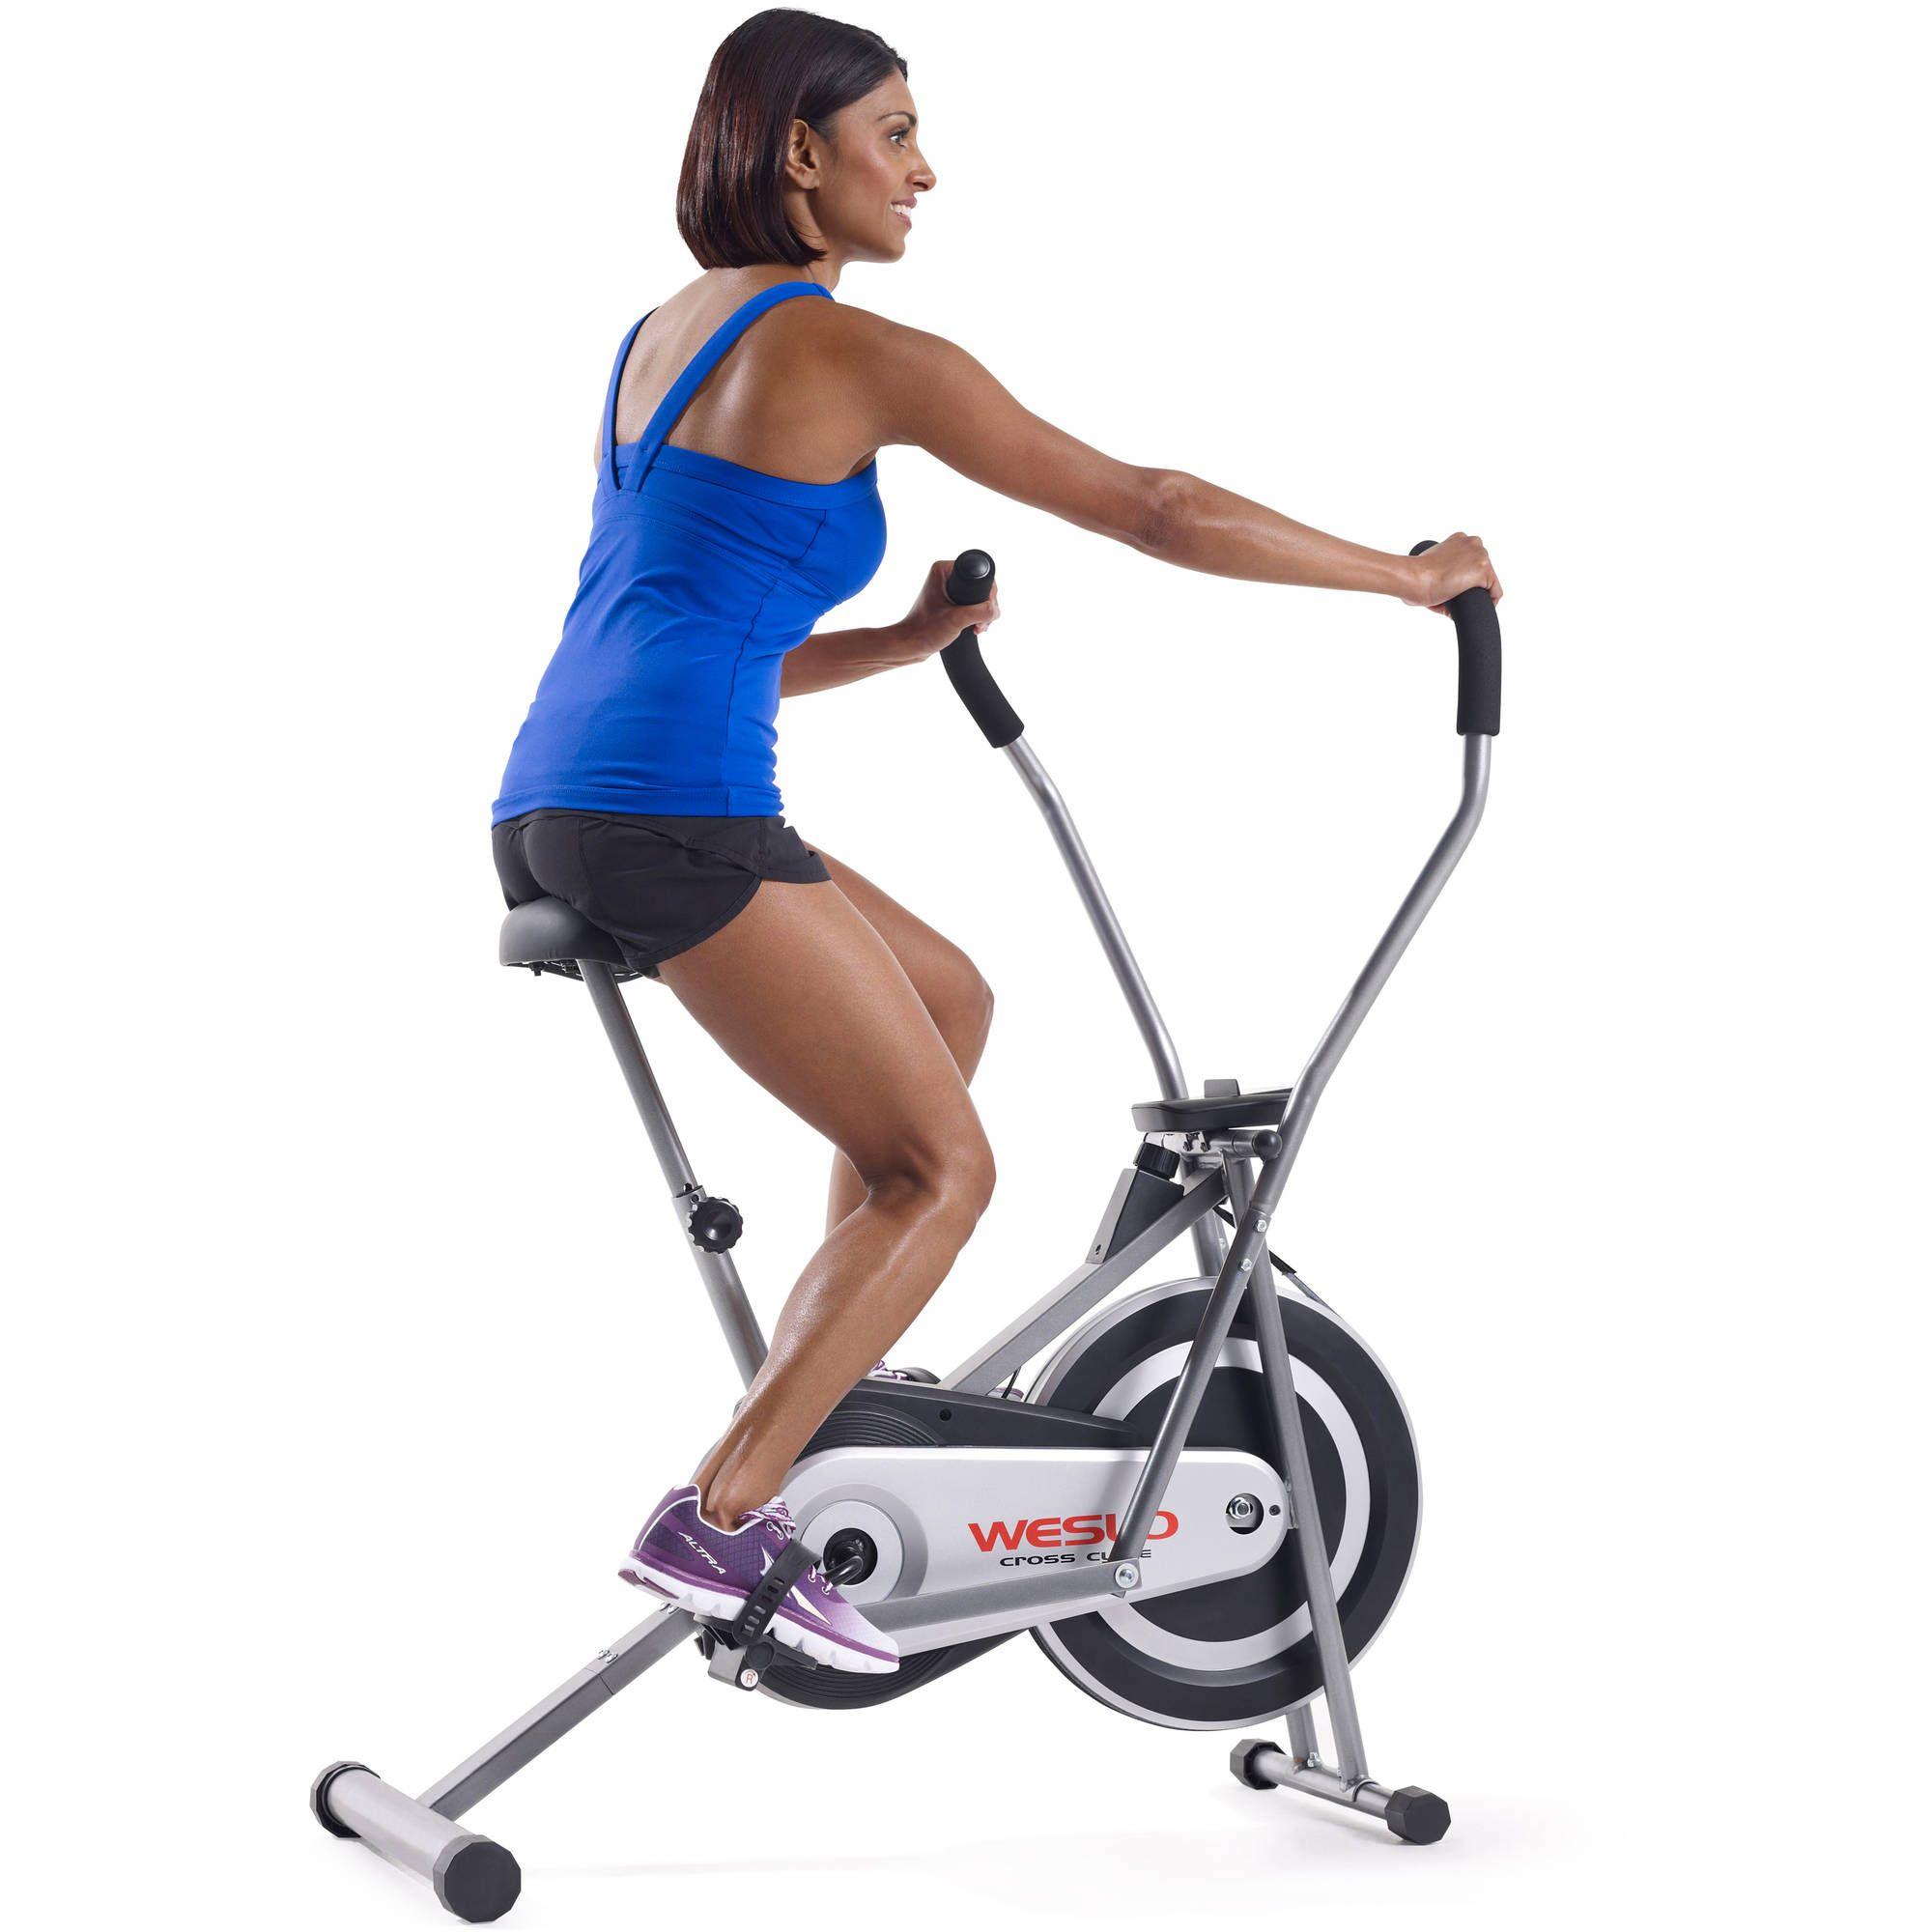 Weslo Cross Cycle Upright Exercise Bike Indoor Cycling Exercise Bicycle Cardio